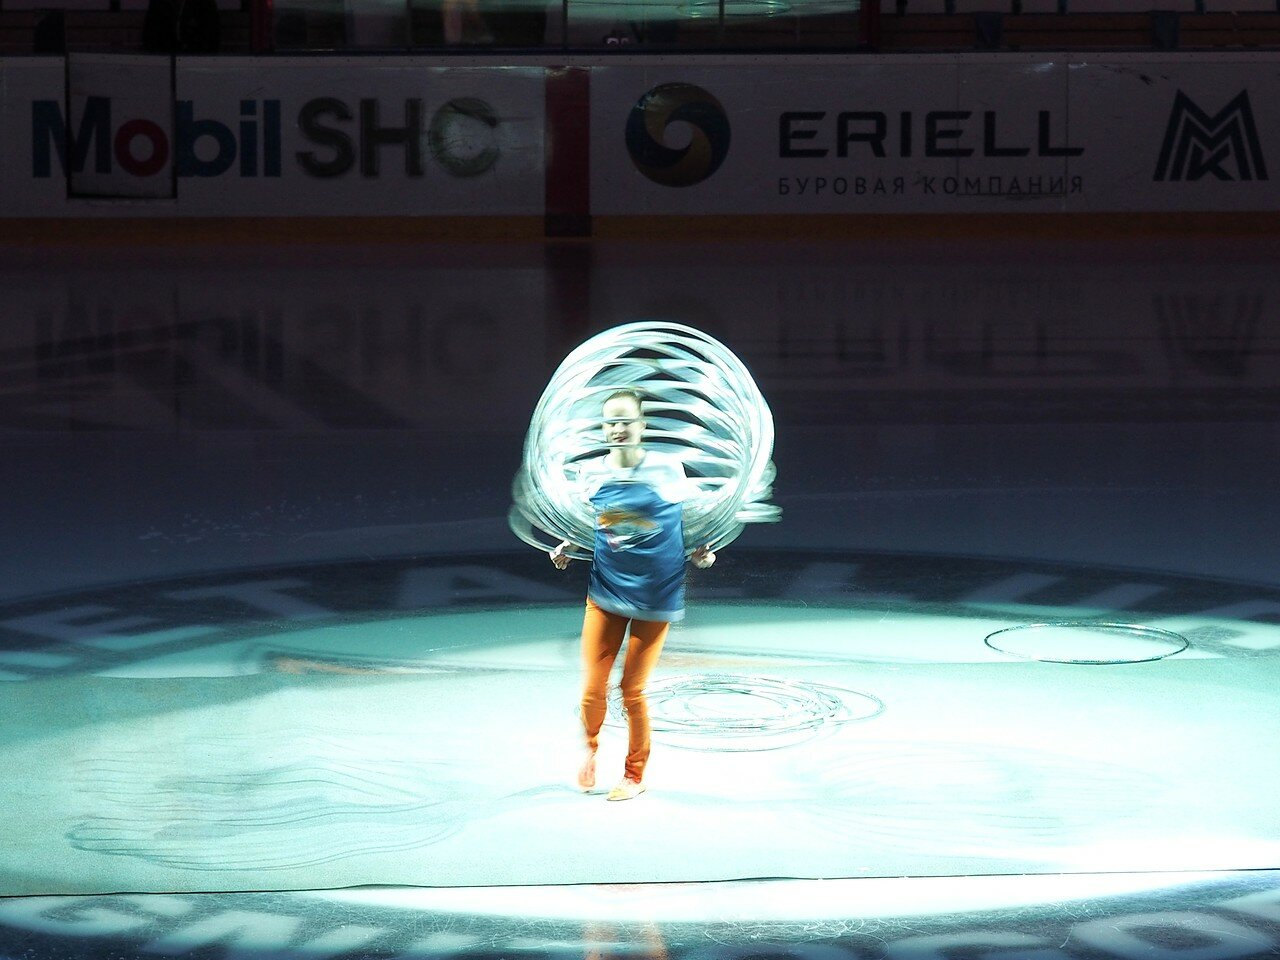 57Плей-офф 2016 Восток Финал Металлург - Салават Юлаев 23.03.2016